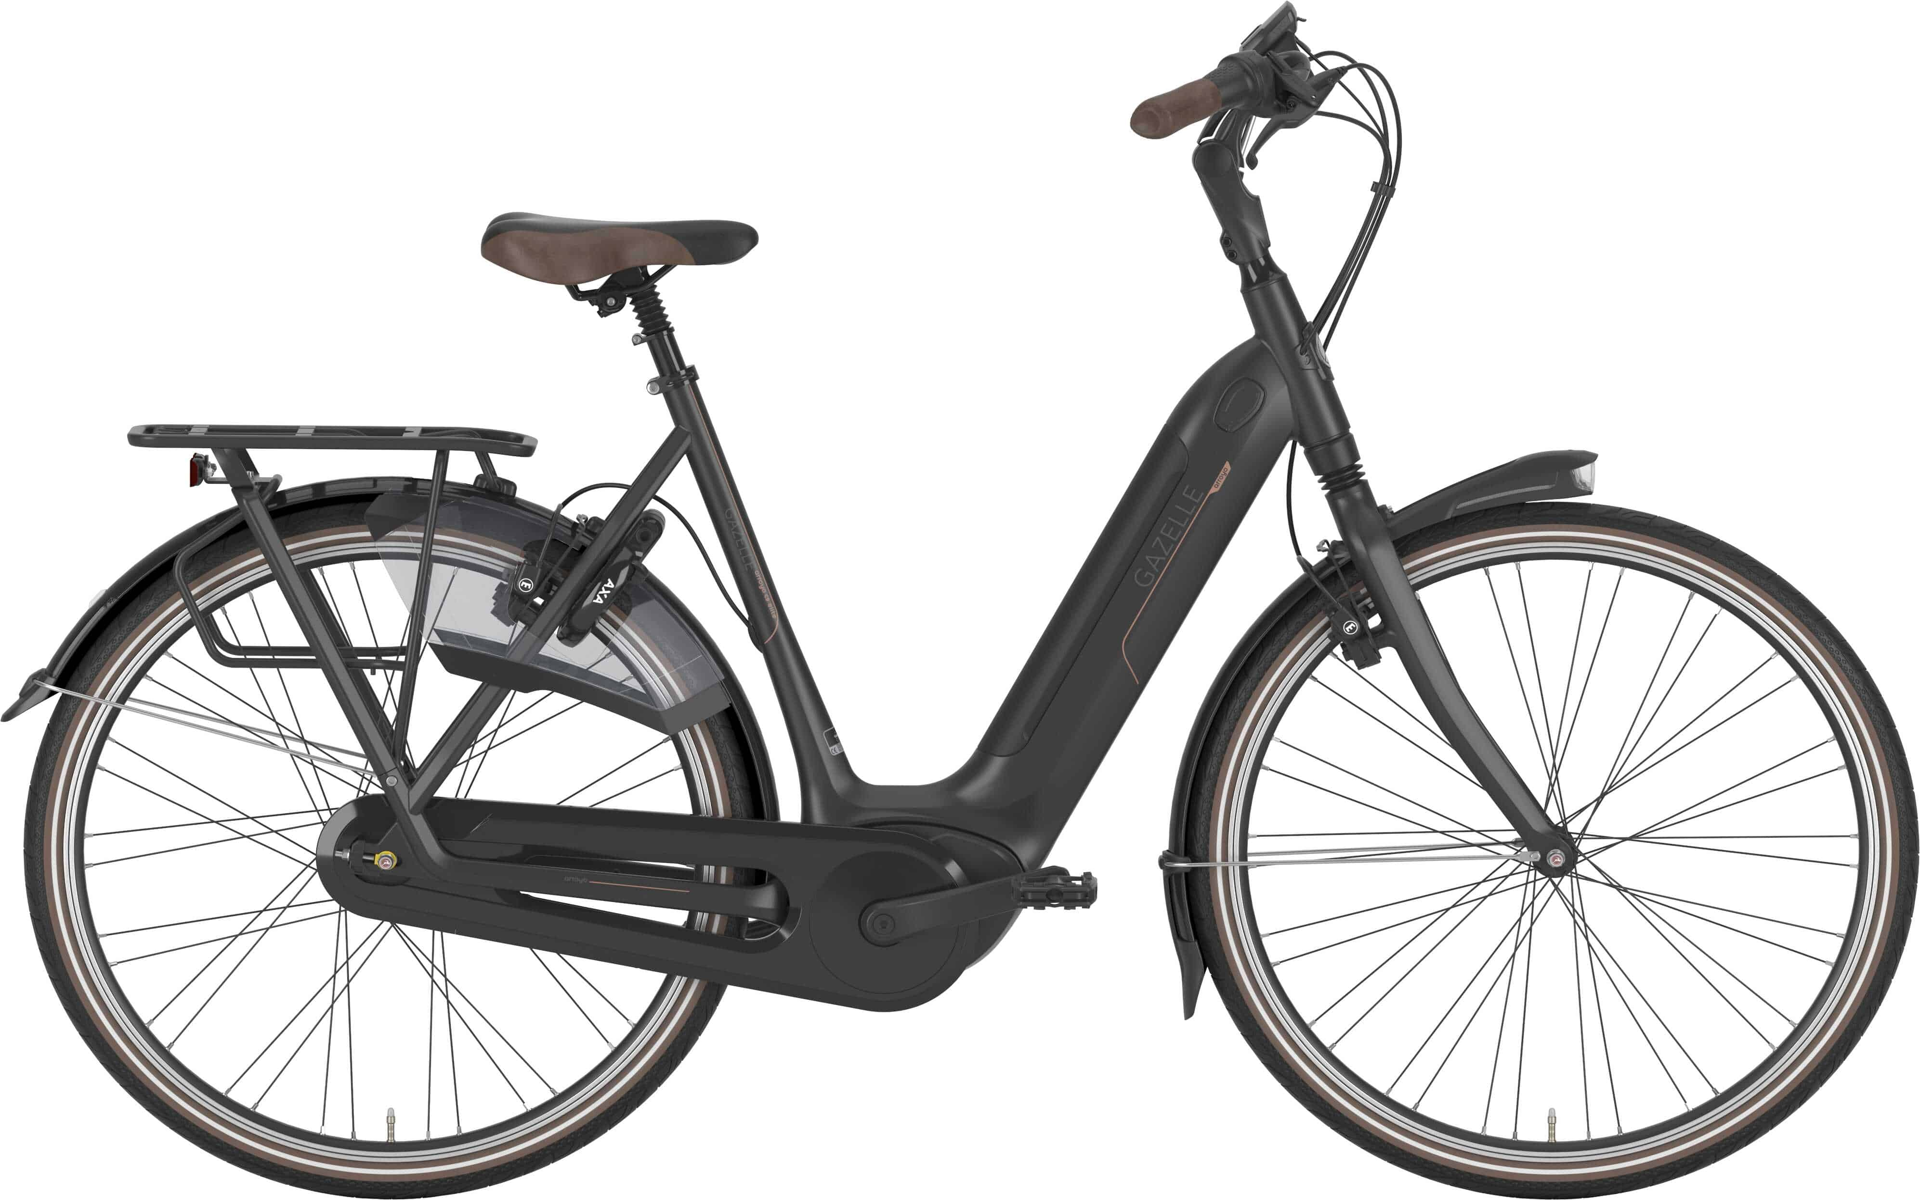 Gazelle Arroyo C8 Hmb Elite Dame Sort - 2020 Cykler  Gazelle  Gazelle Elcykler